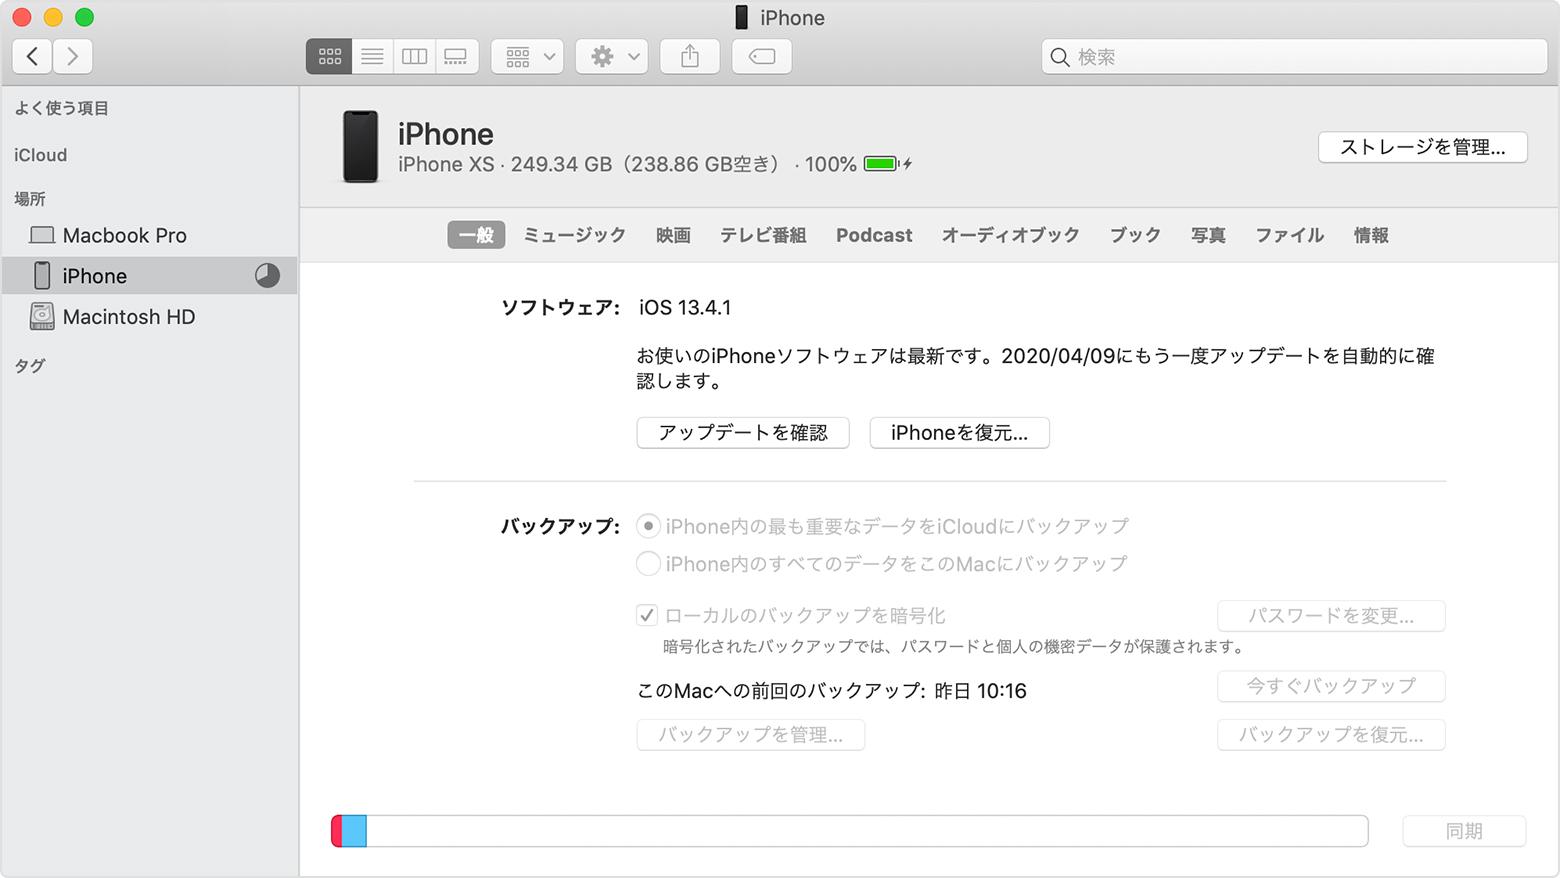 iTunesを使ったバックアップ方法